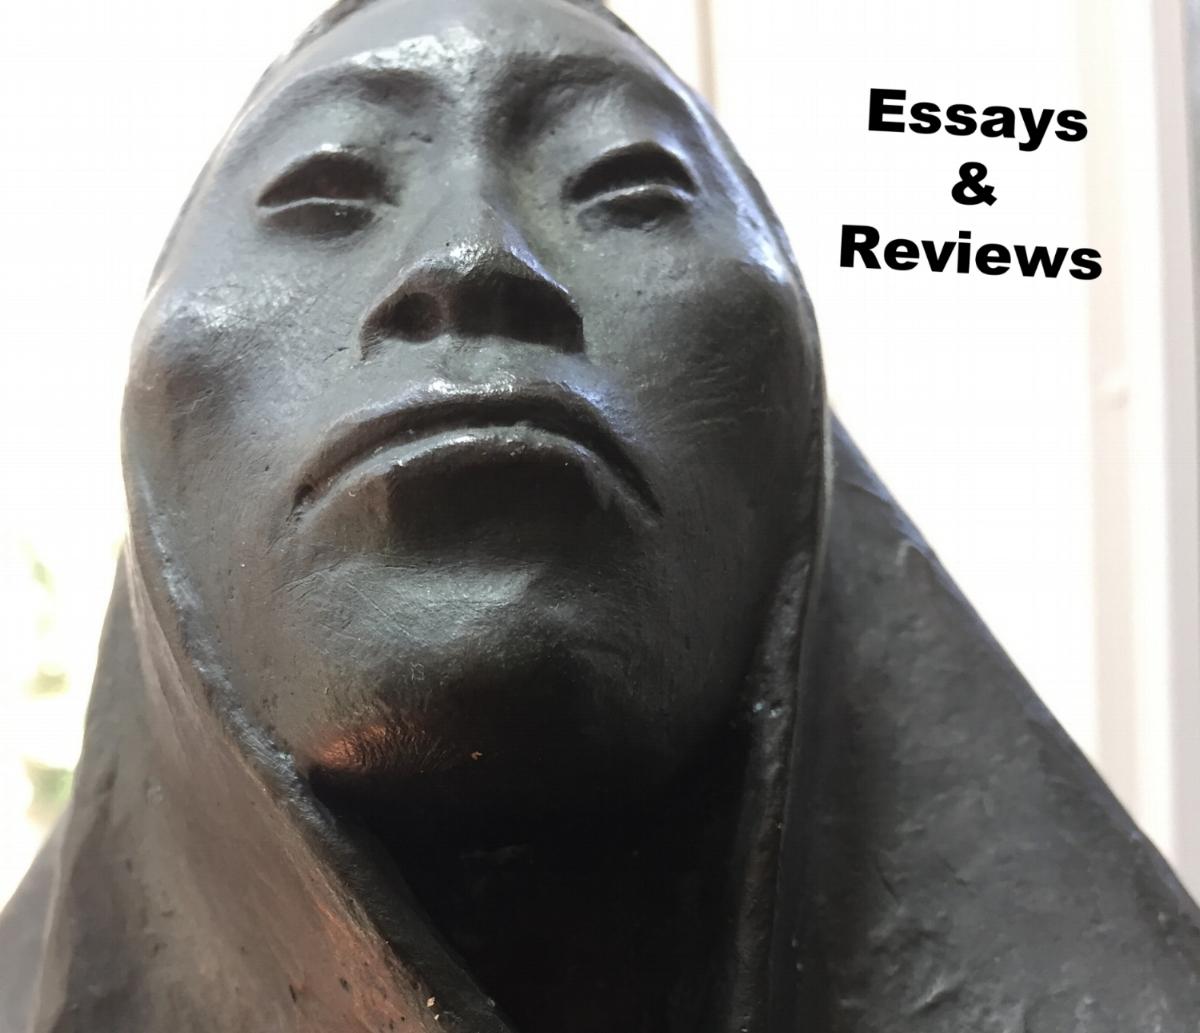 essays and reviews_ Sholeh wolpe.jpg